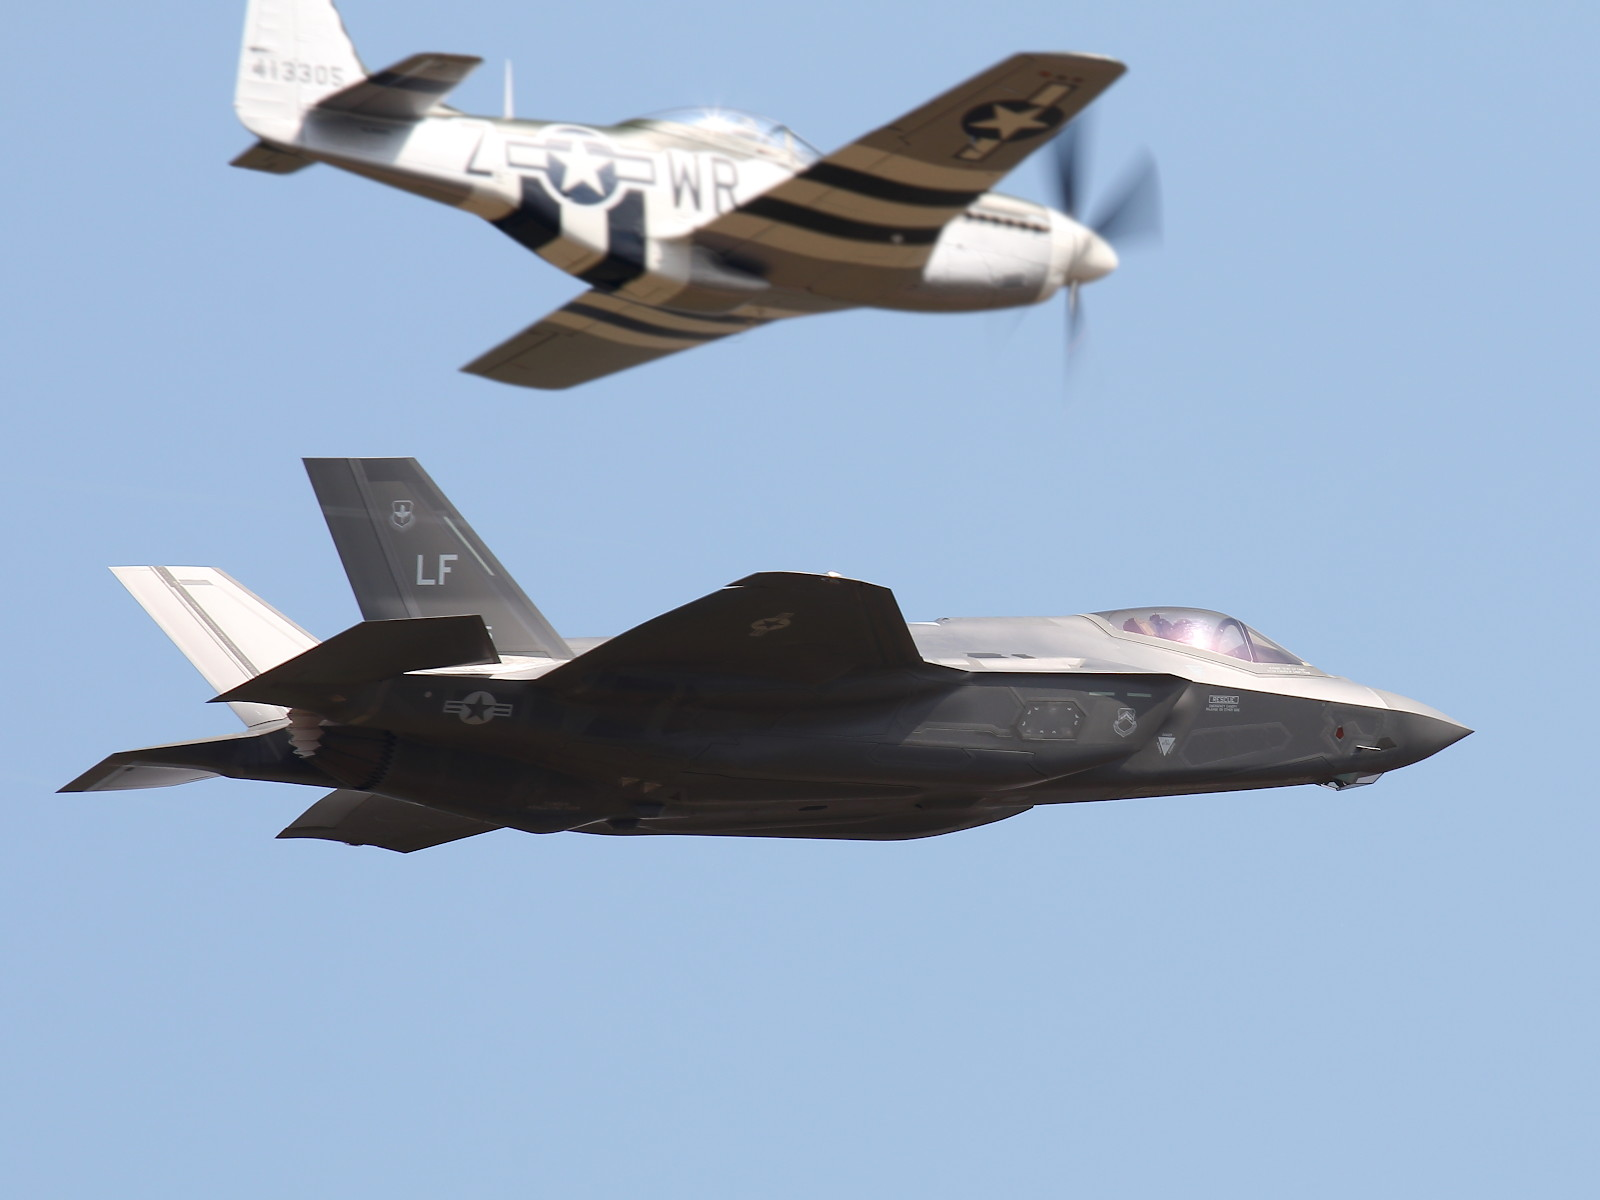 USAF Heritage Flight Team © Doppeladler.com